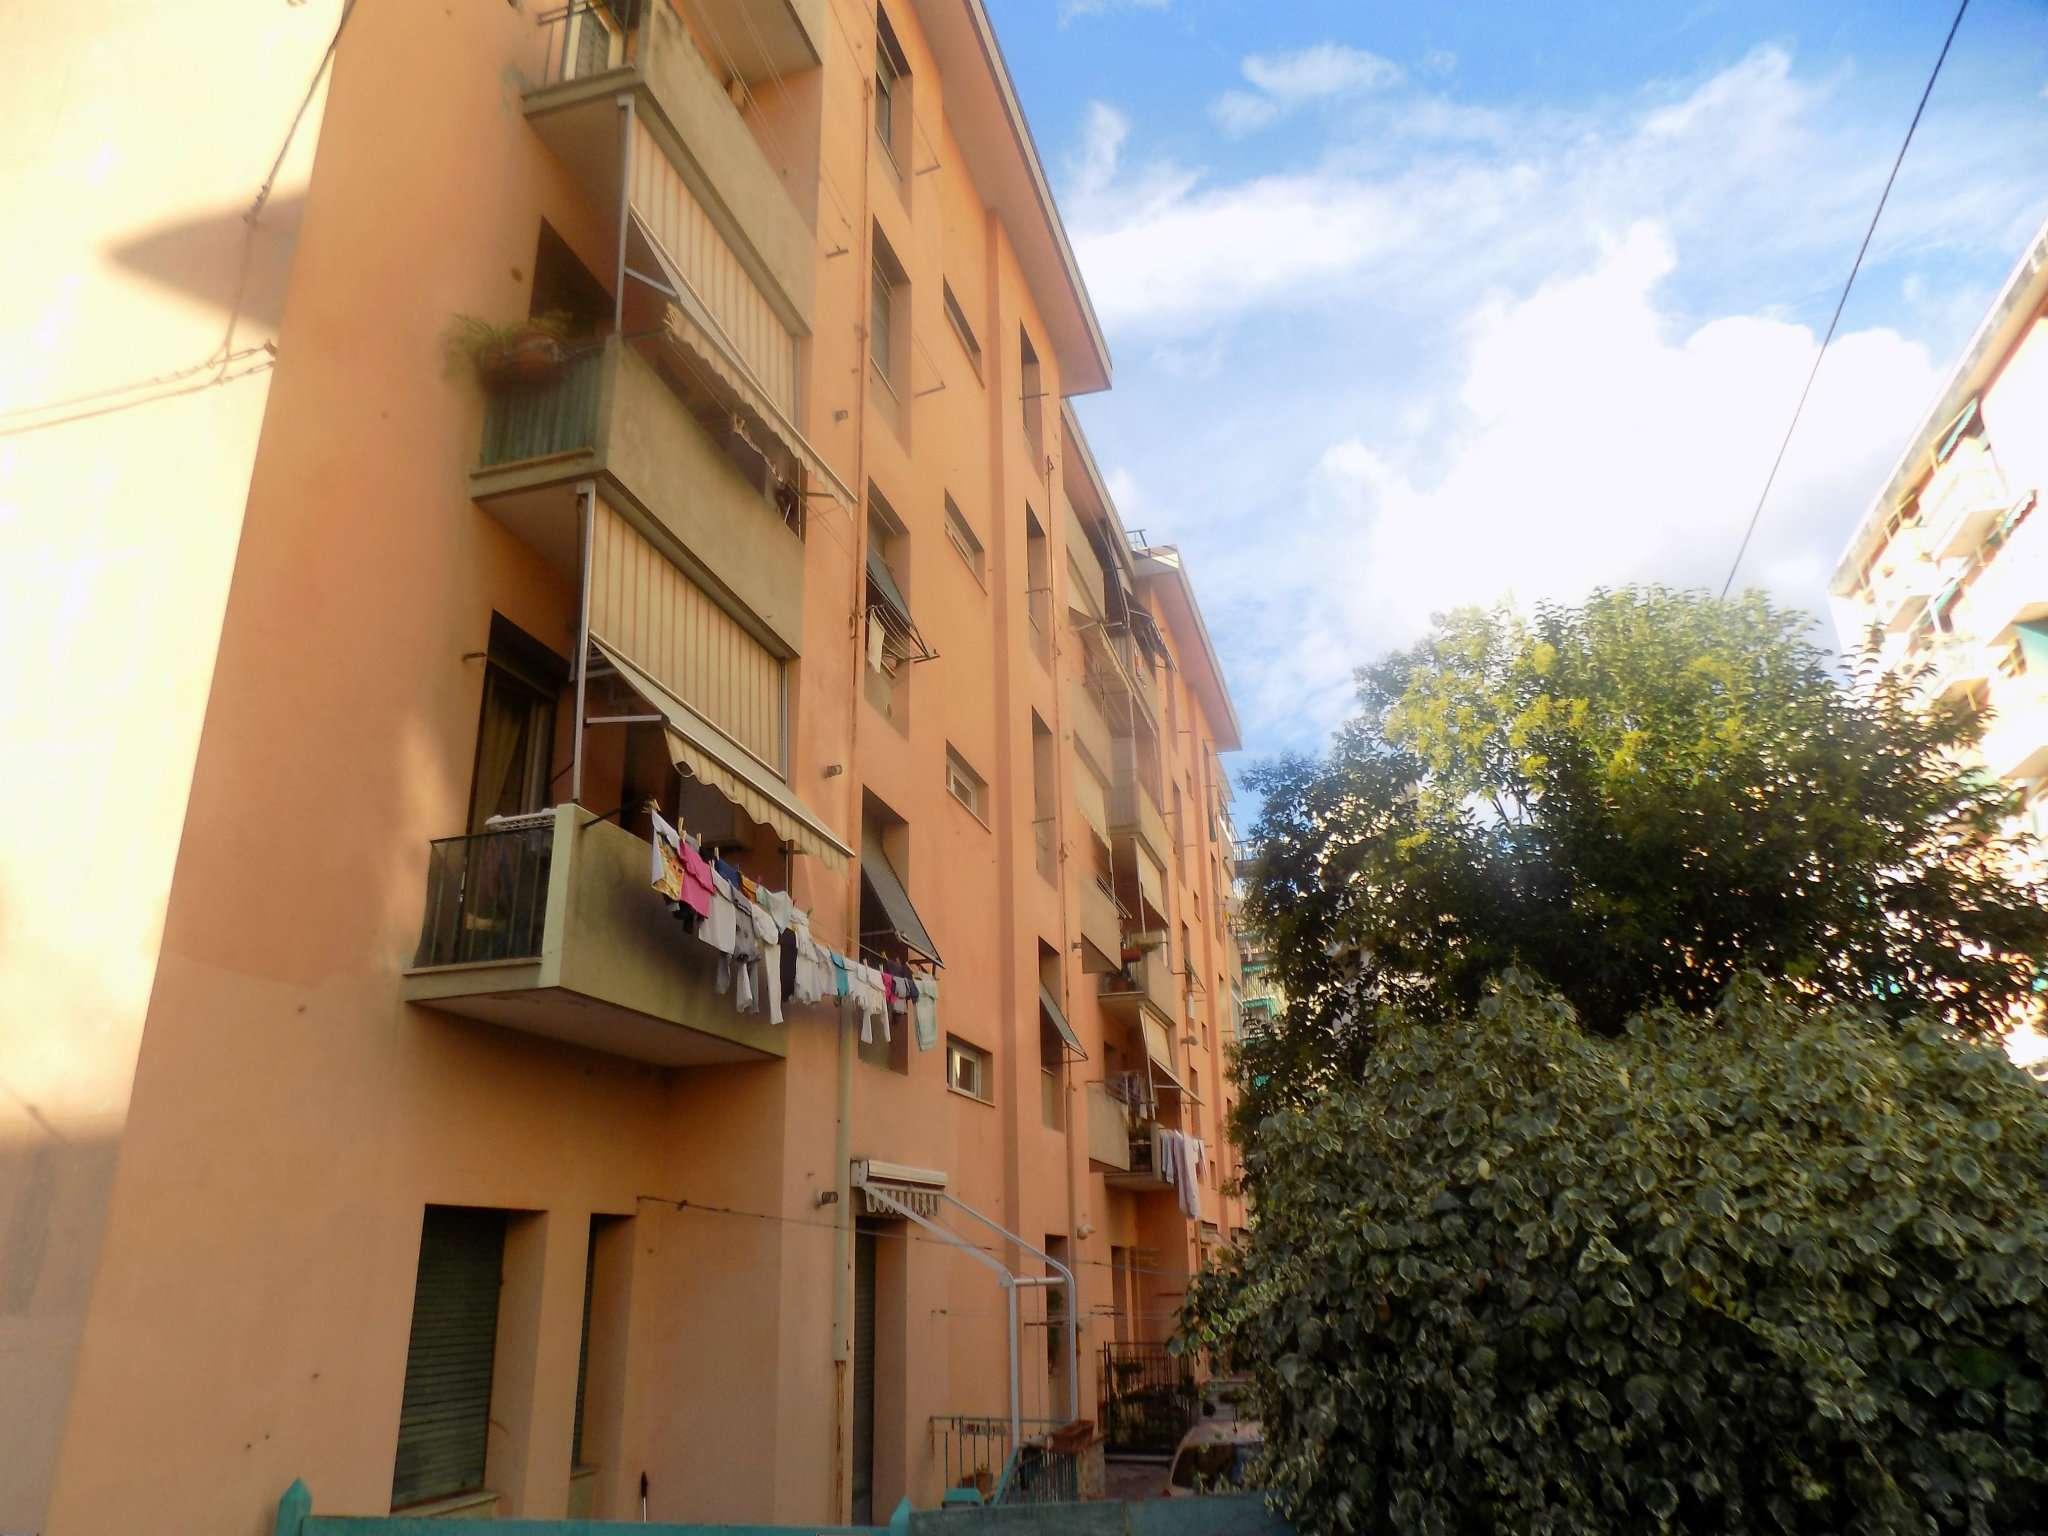 Bilocale Genova Via Isonzo 1